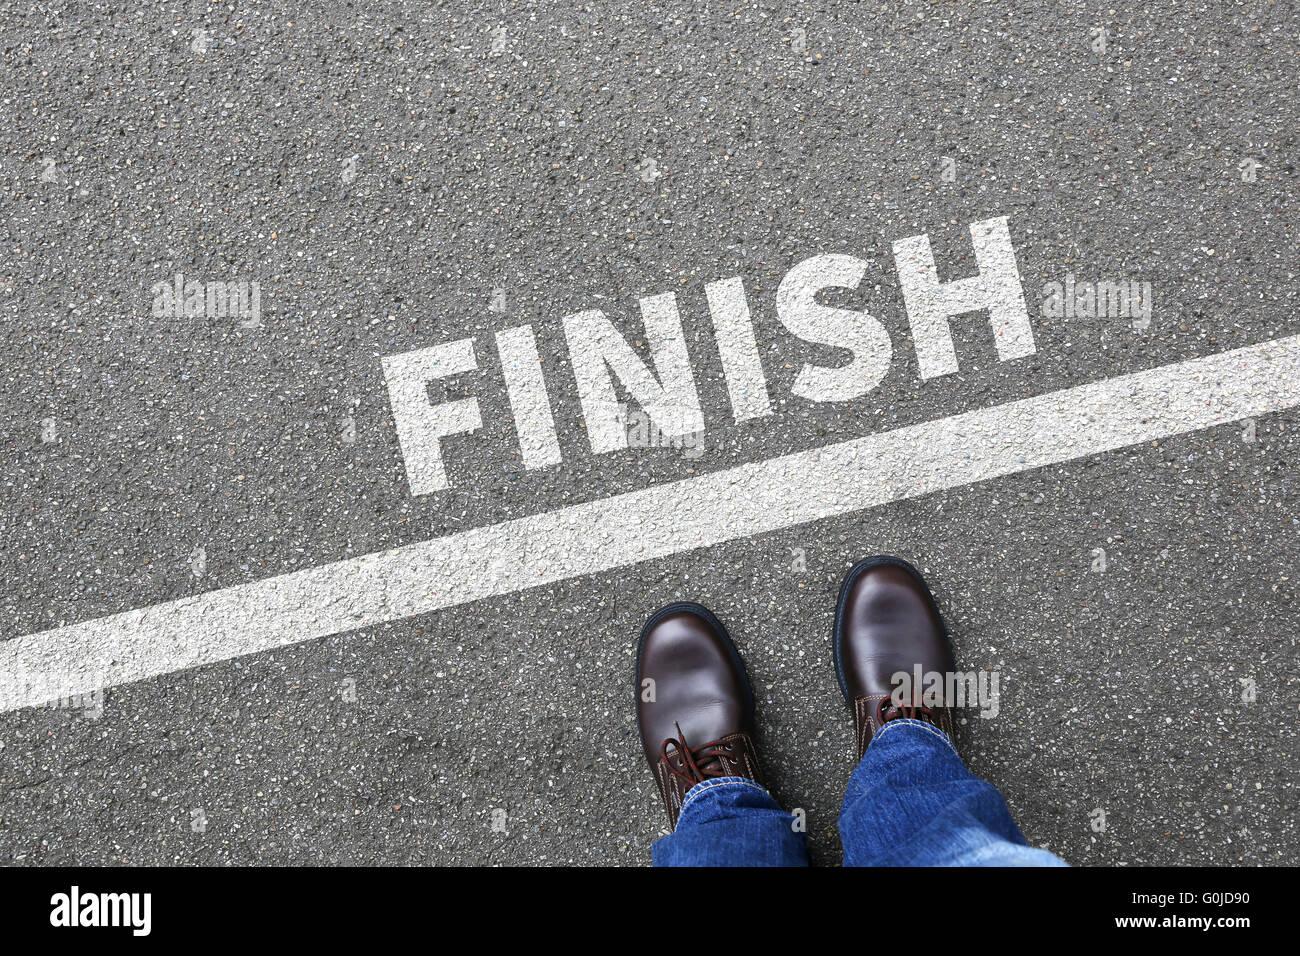 Finish line winning success running race businessman business man concept career goals motivation vision - Stock Image